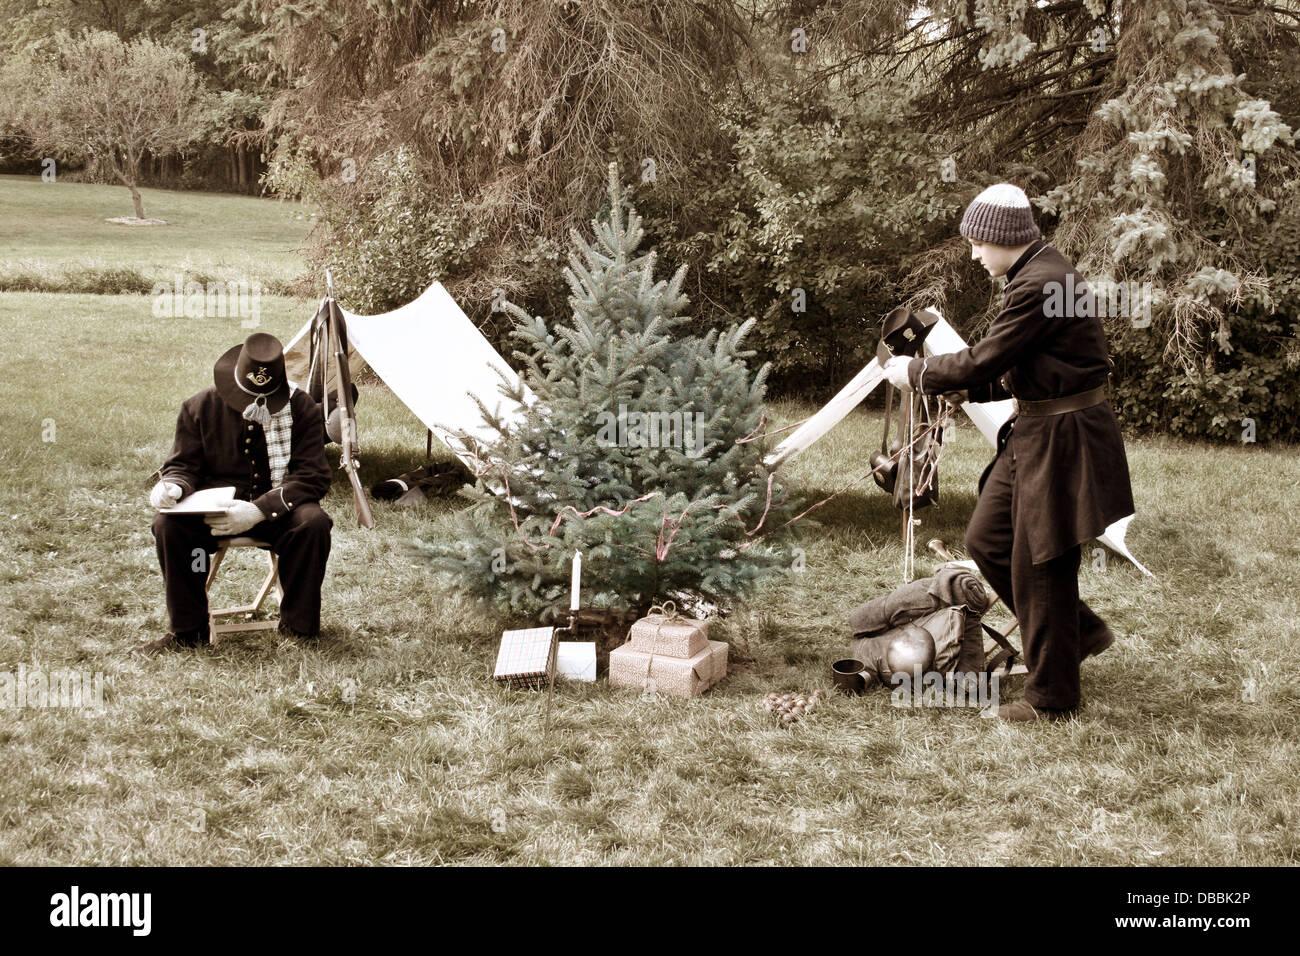 Young Civil War soldier reenactors at Christmas time decorating a ...